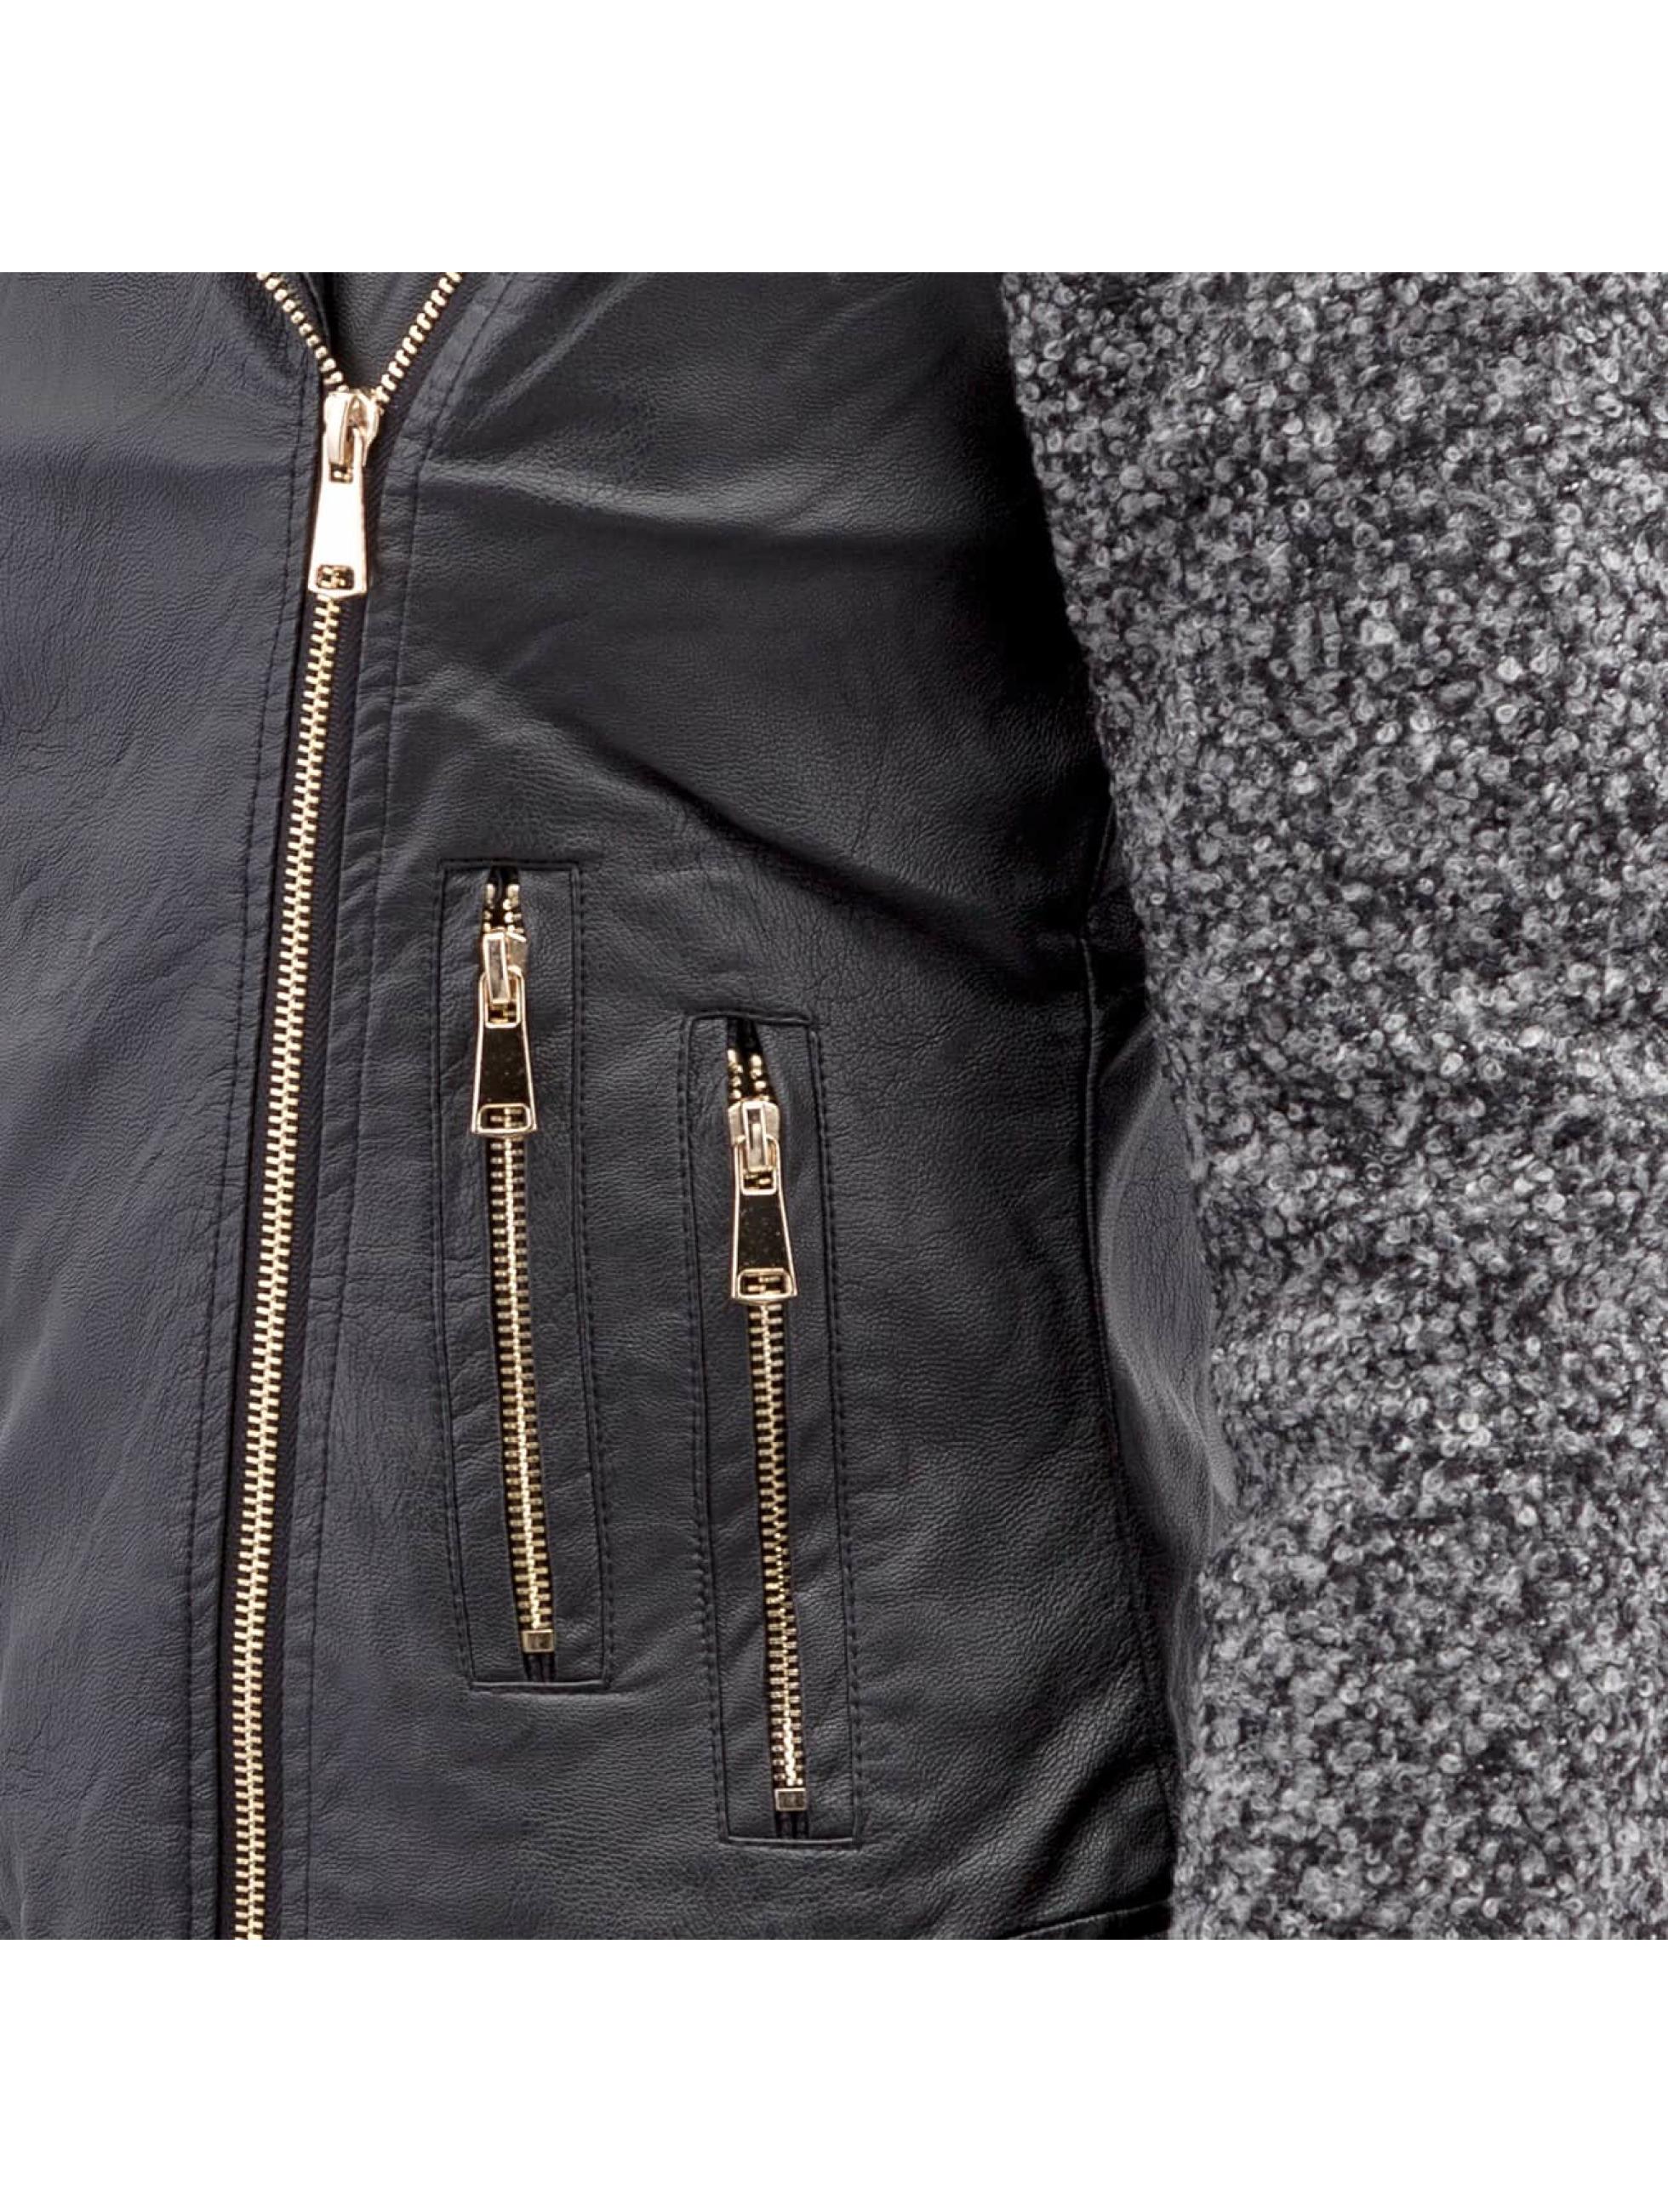 Hailys Transitional Jackets Ceclilia Pop svart